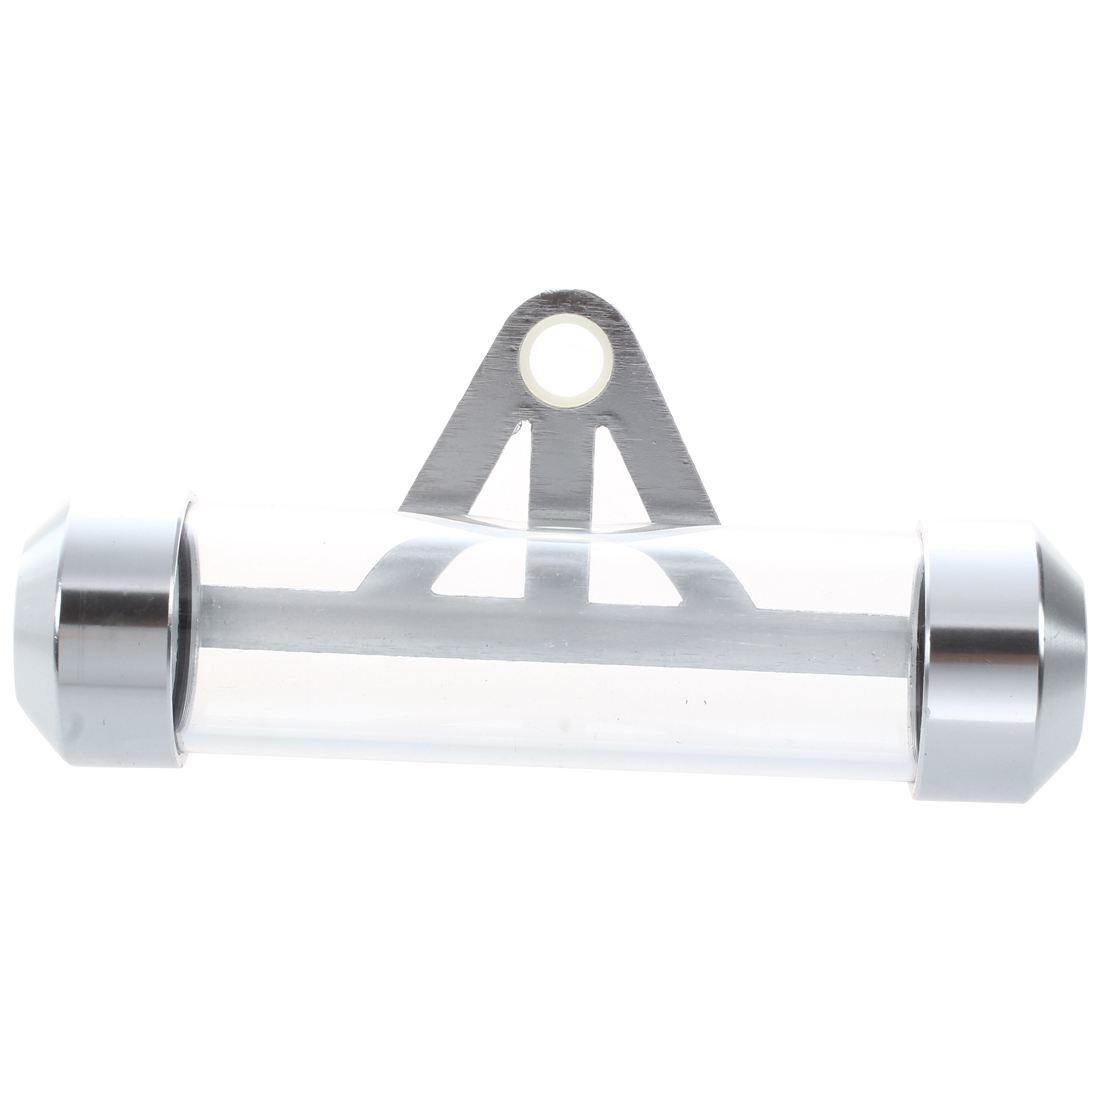 Soporte-de-tubo-de-disco-de-impuesto-de-metal-Moto-Scooter-Motocicleta-Ciclo-PB miniatura 9